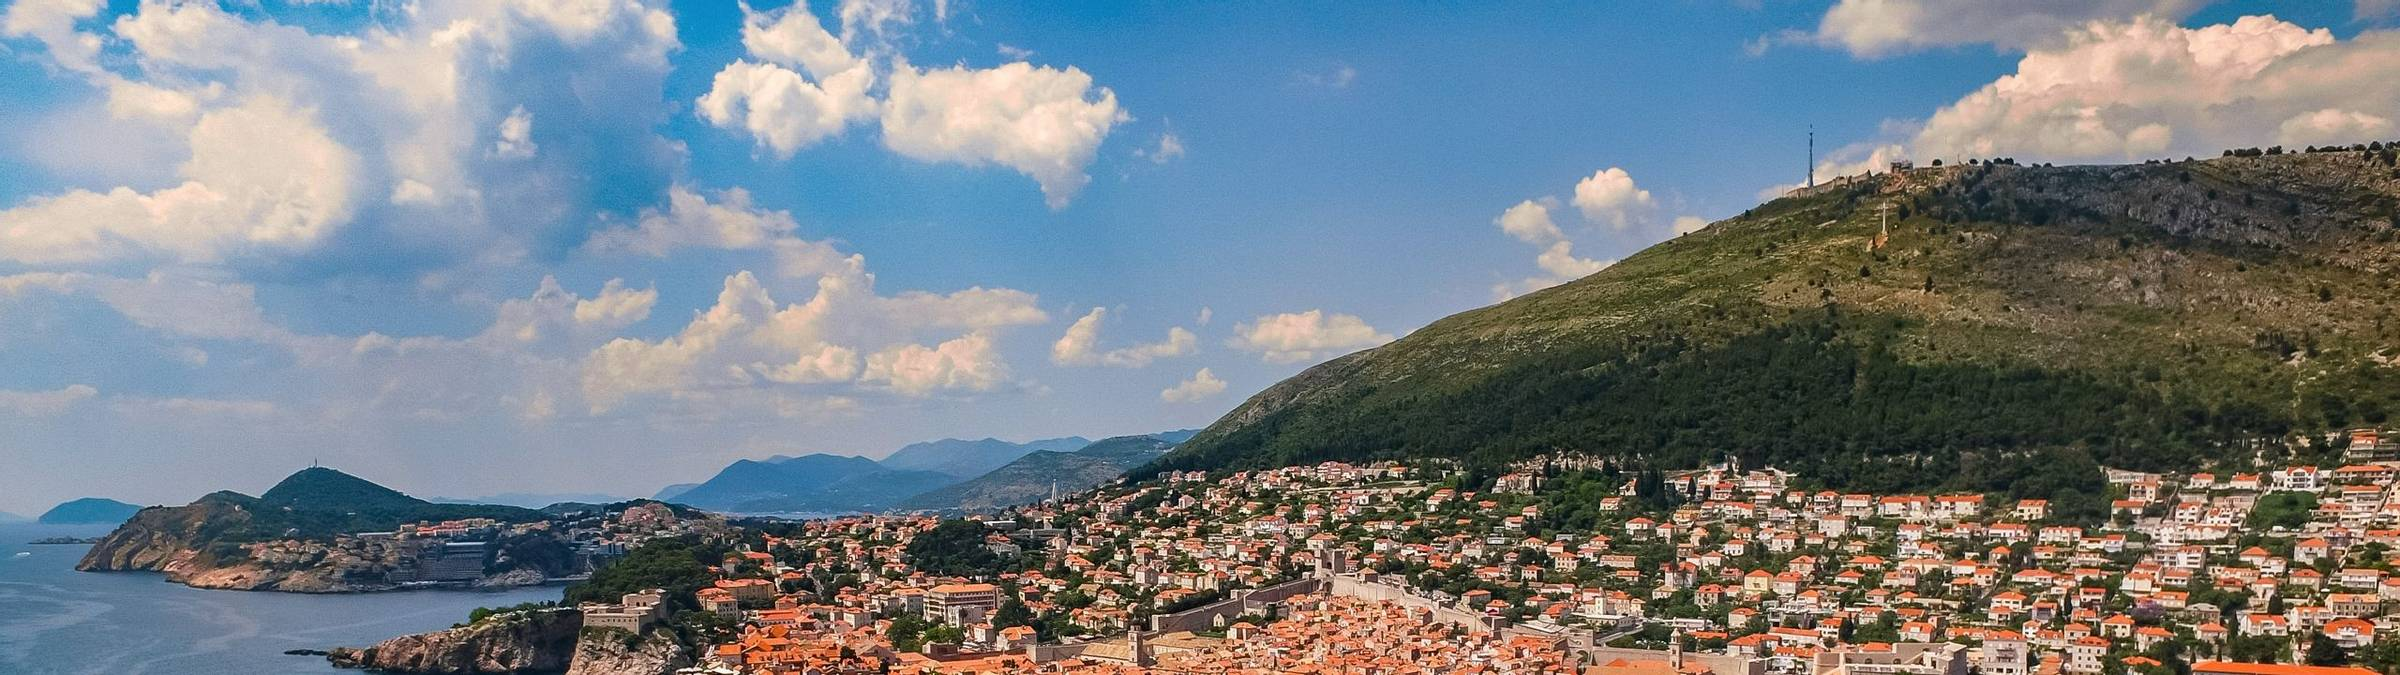 Dubrovnik   Credit Ivo Biocina   Croatian National Tourist Boar